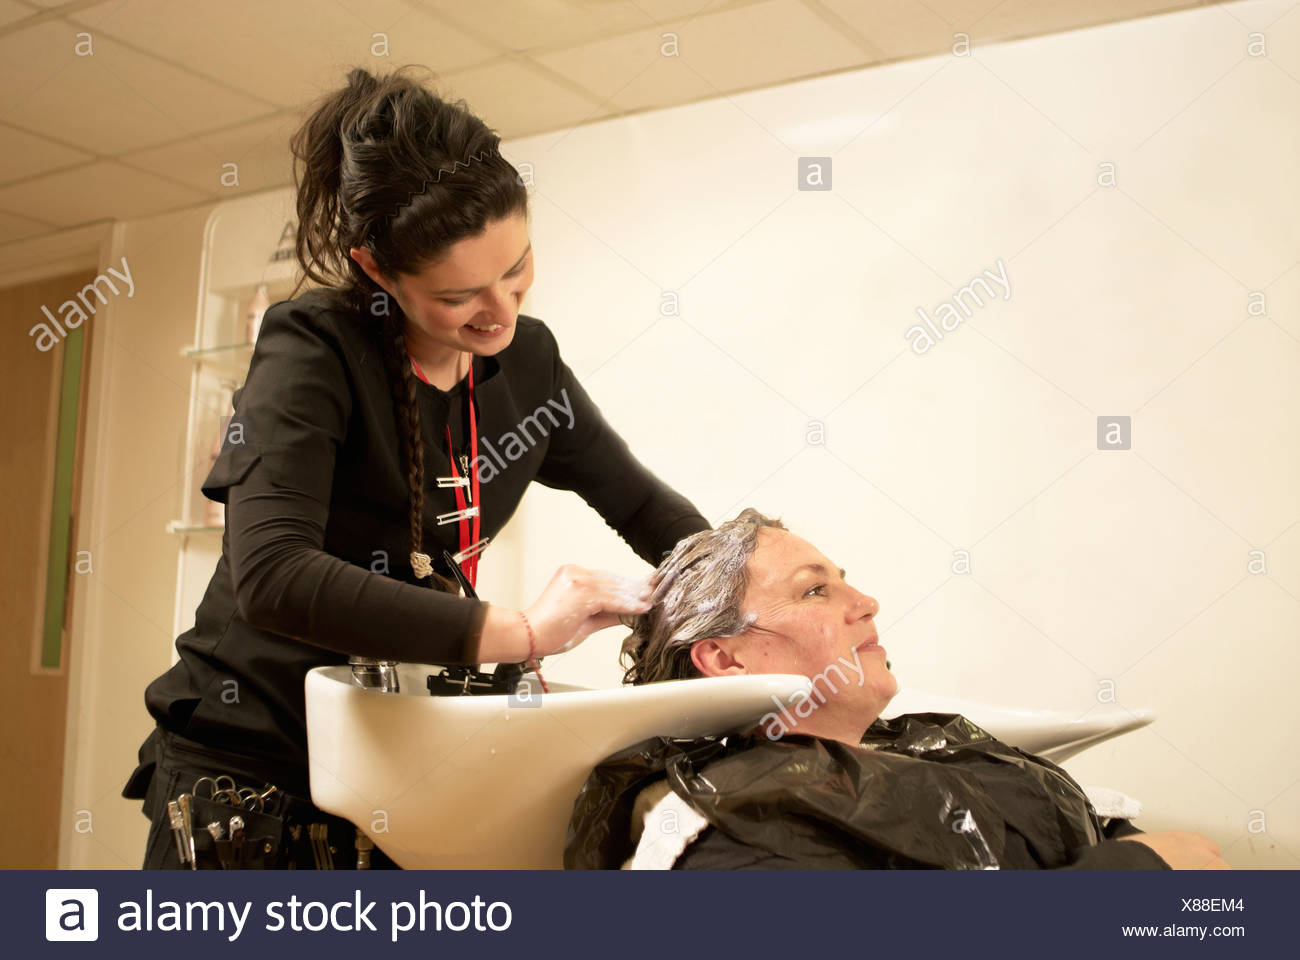 Salon de beauté hair laver Photo Stock